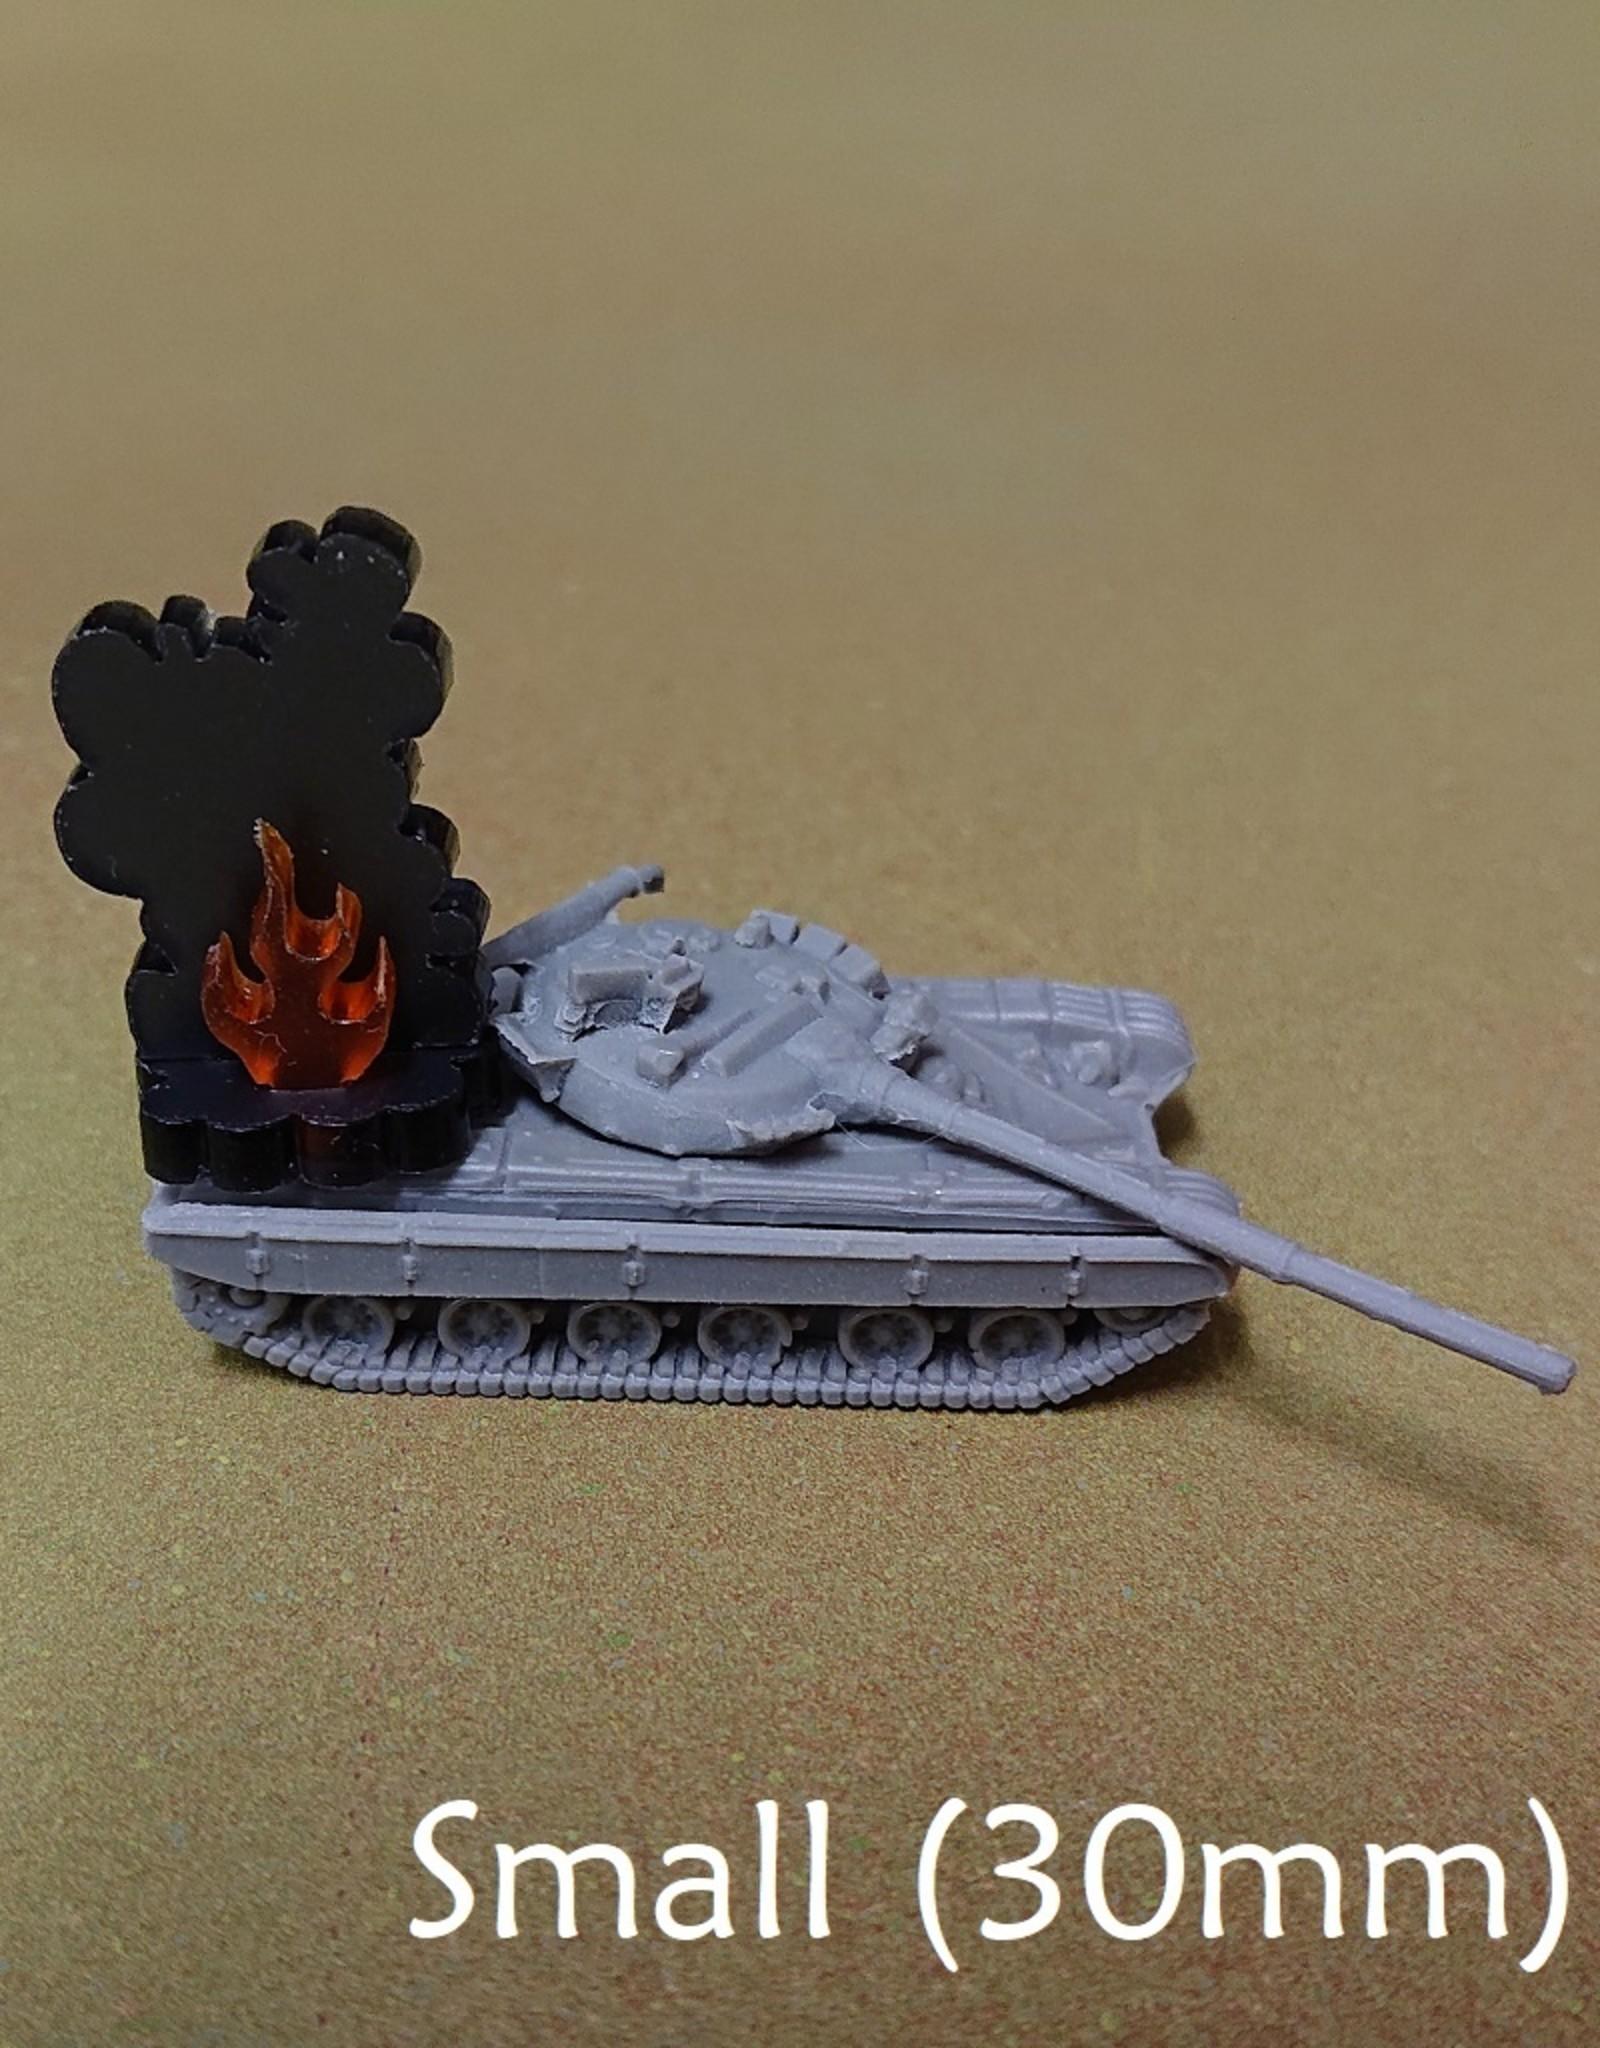 Olympian Games Burning Wreckage